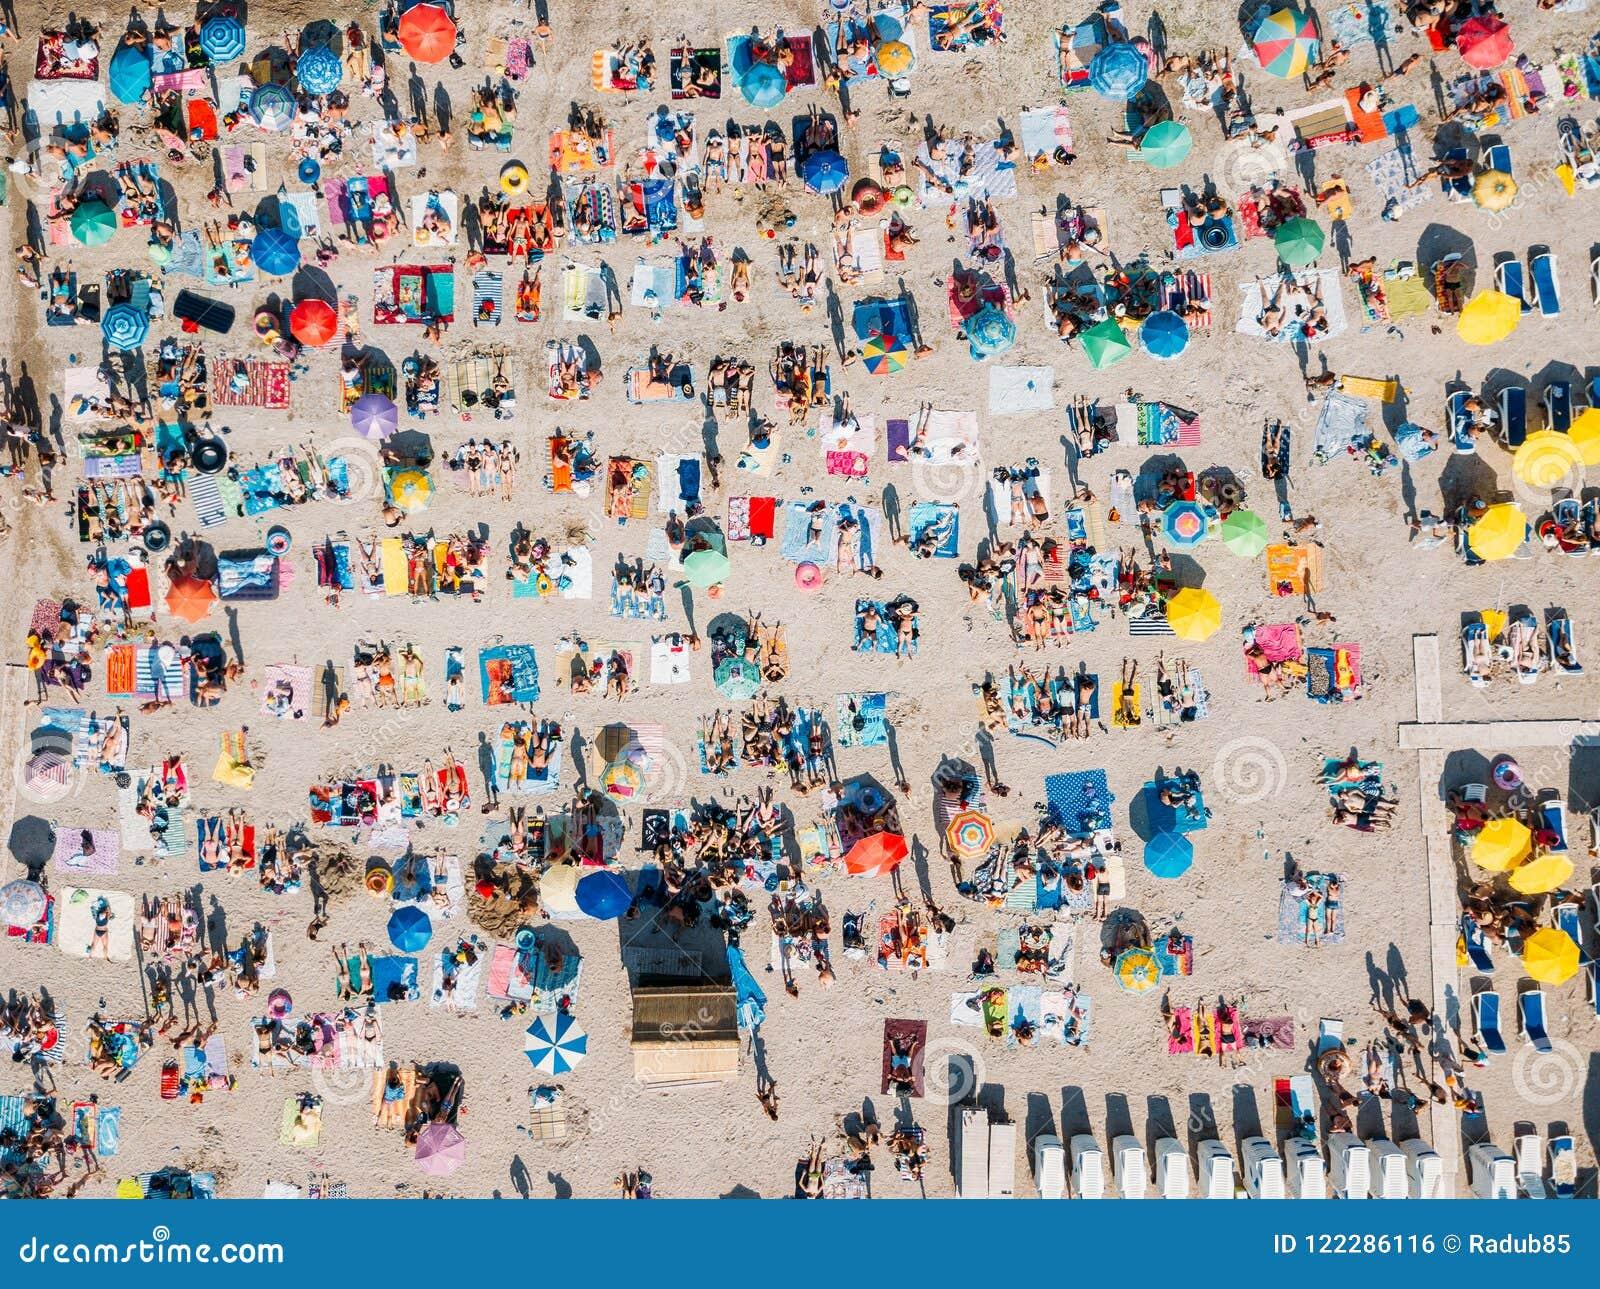 Aerial Summer View Of Beach Full Of People